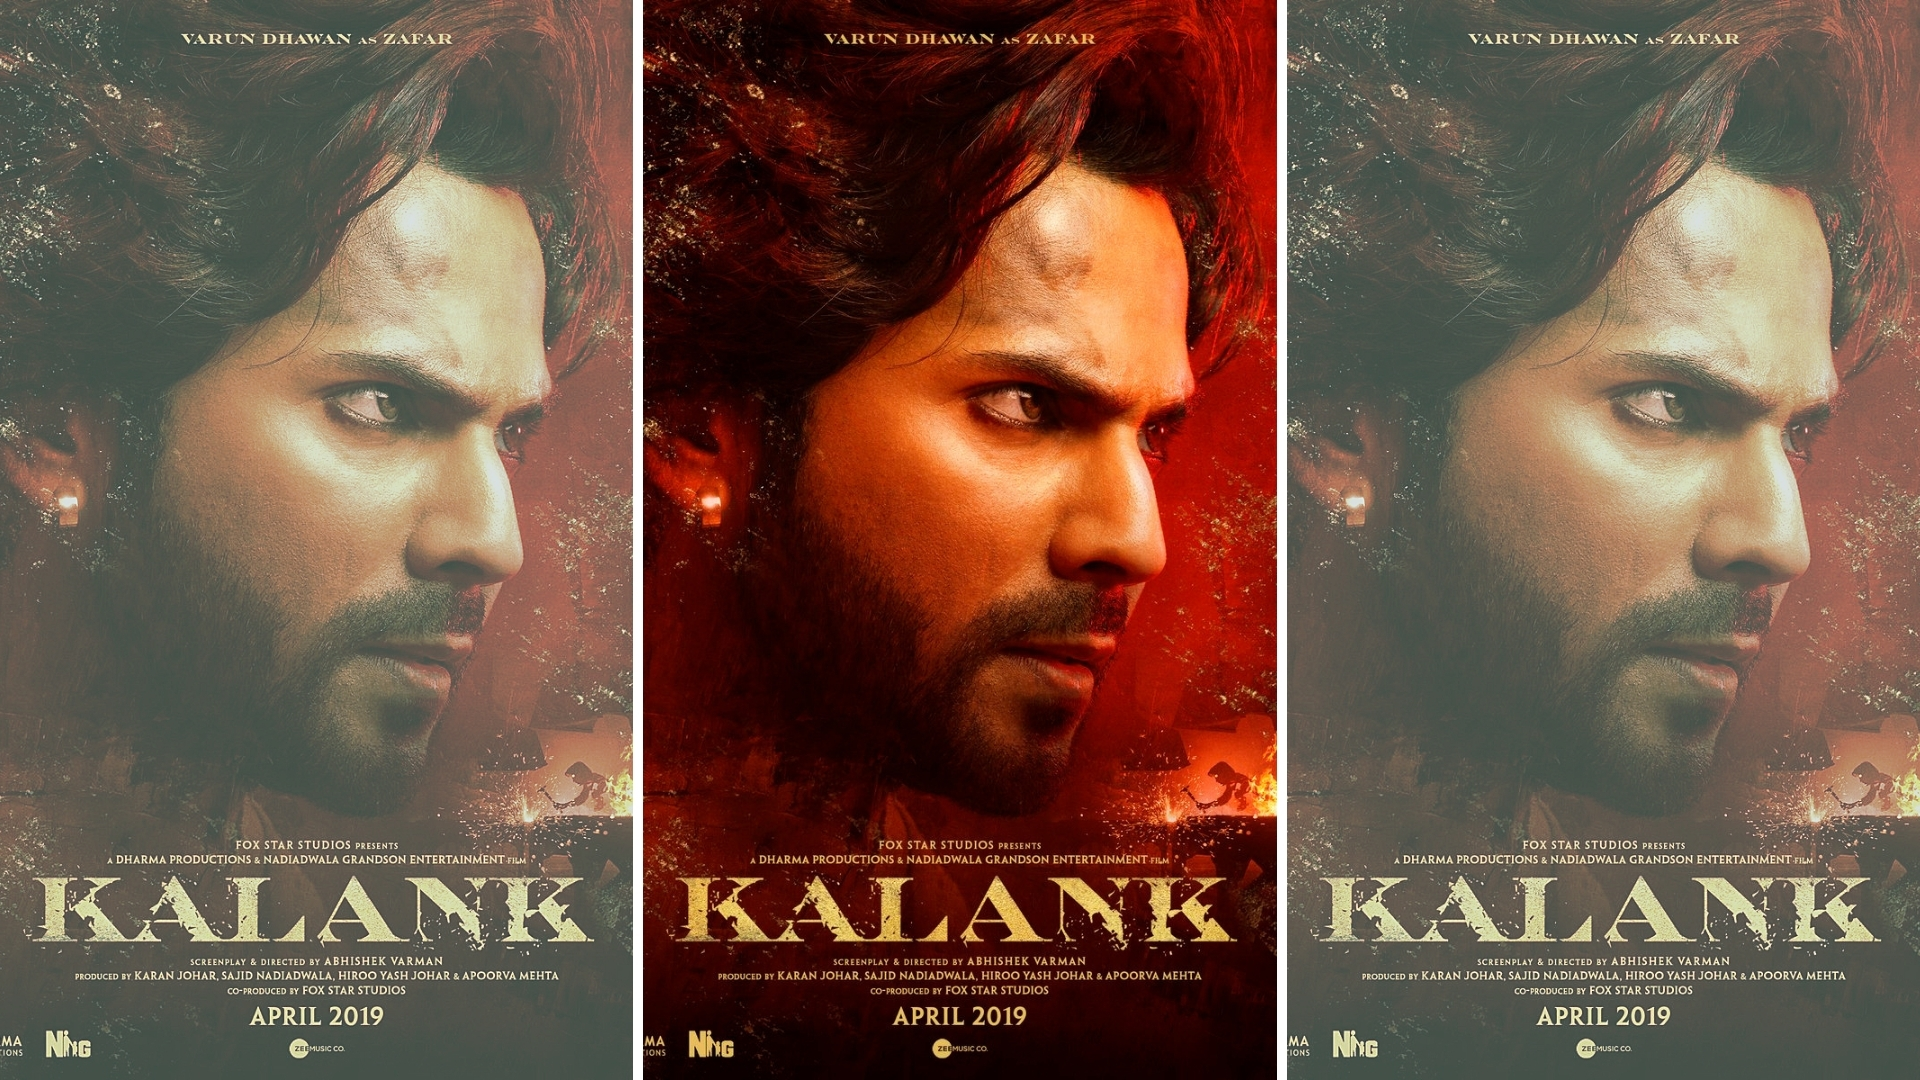 Kalank Release Date Preponed Mp3: Entertainment News Today: 'Kalank', 'Panga' First Looks